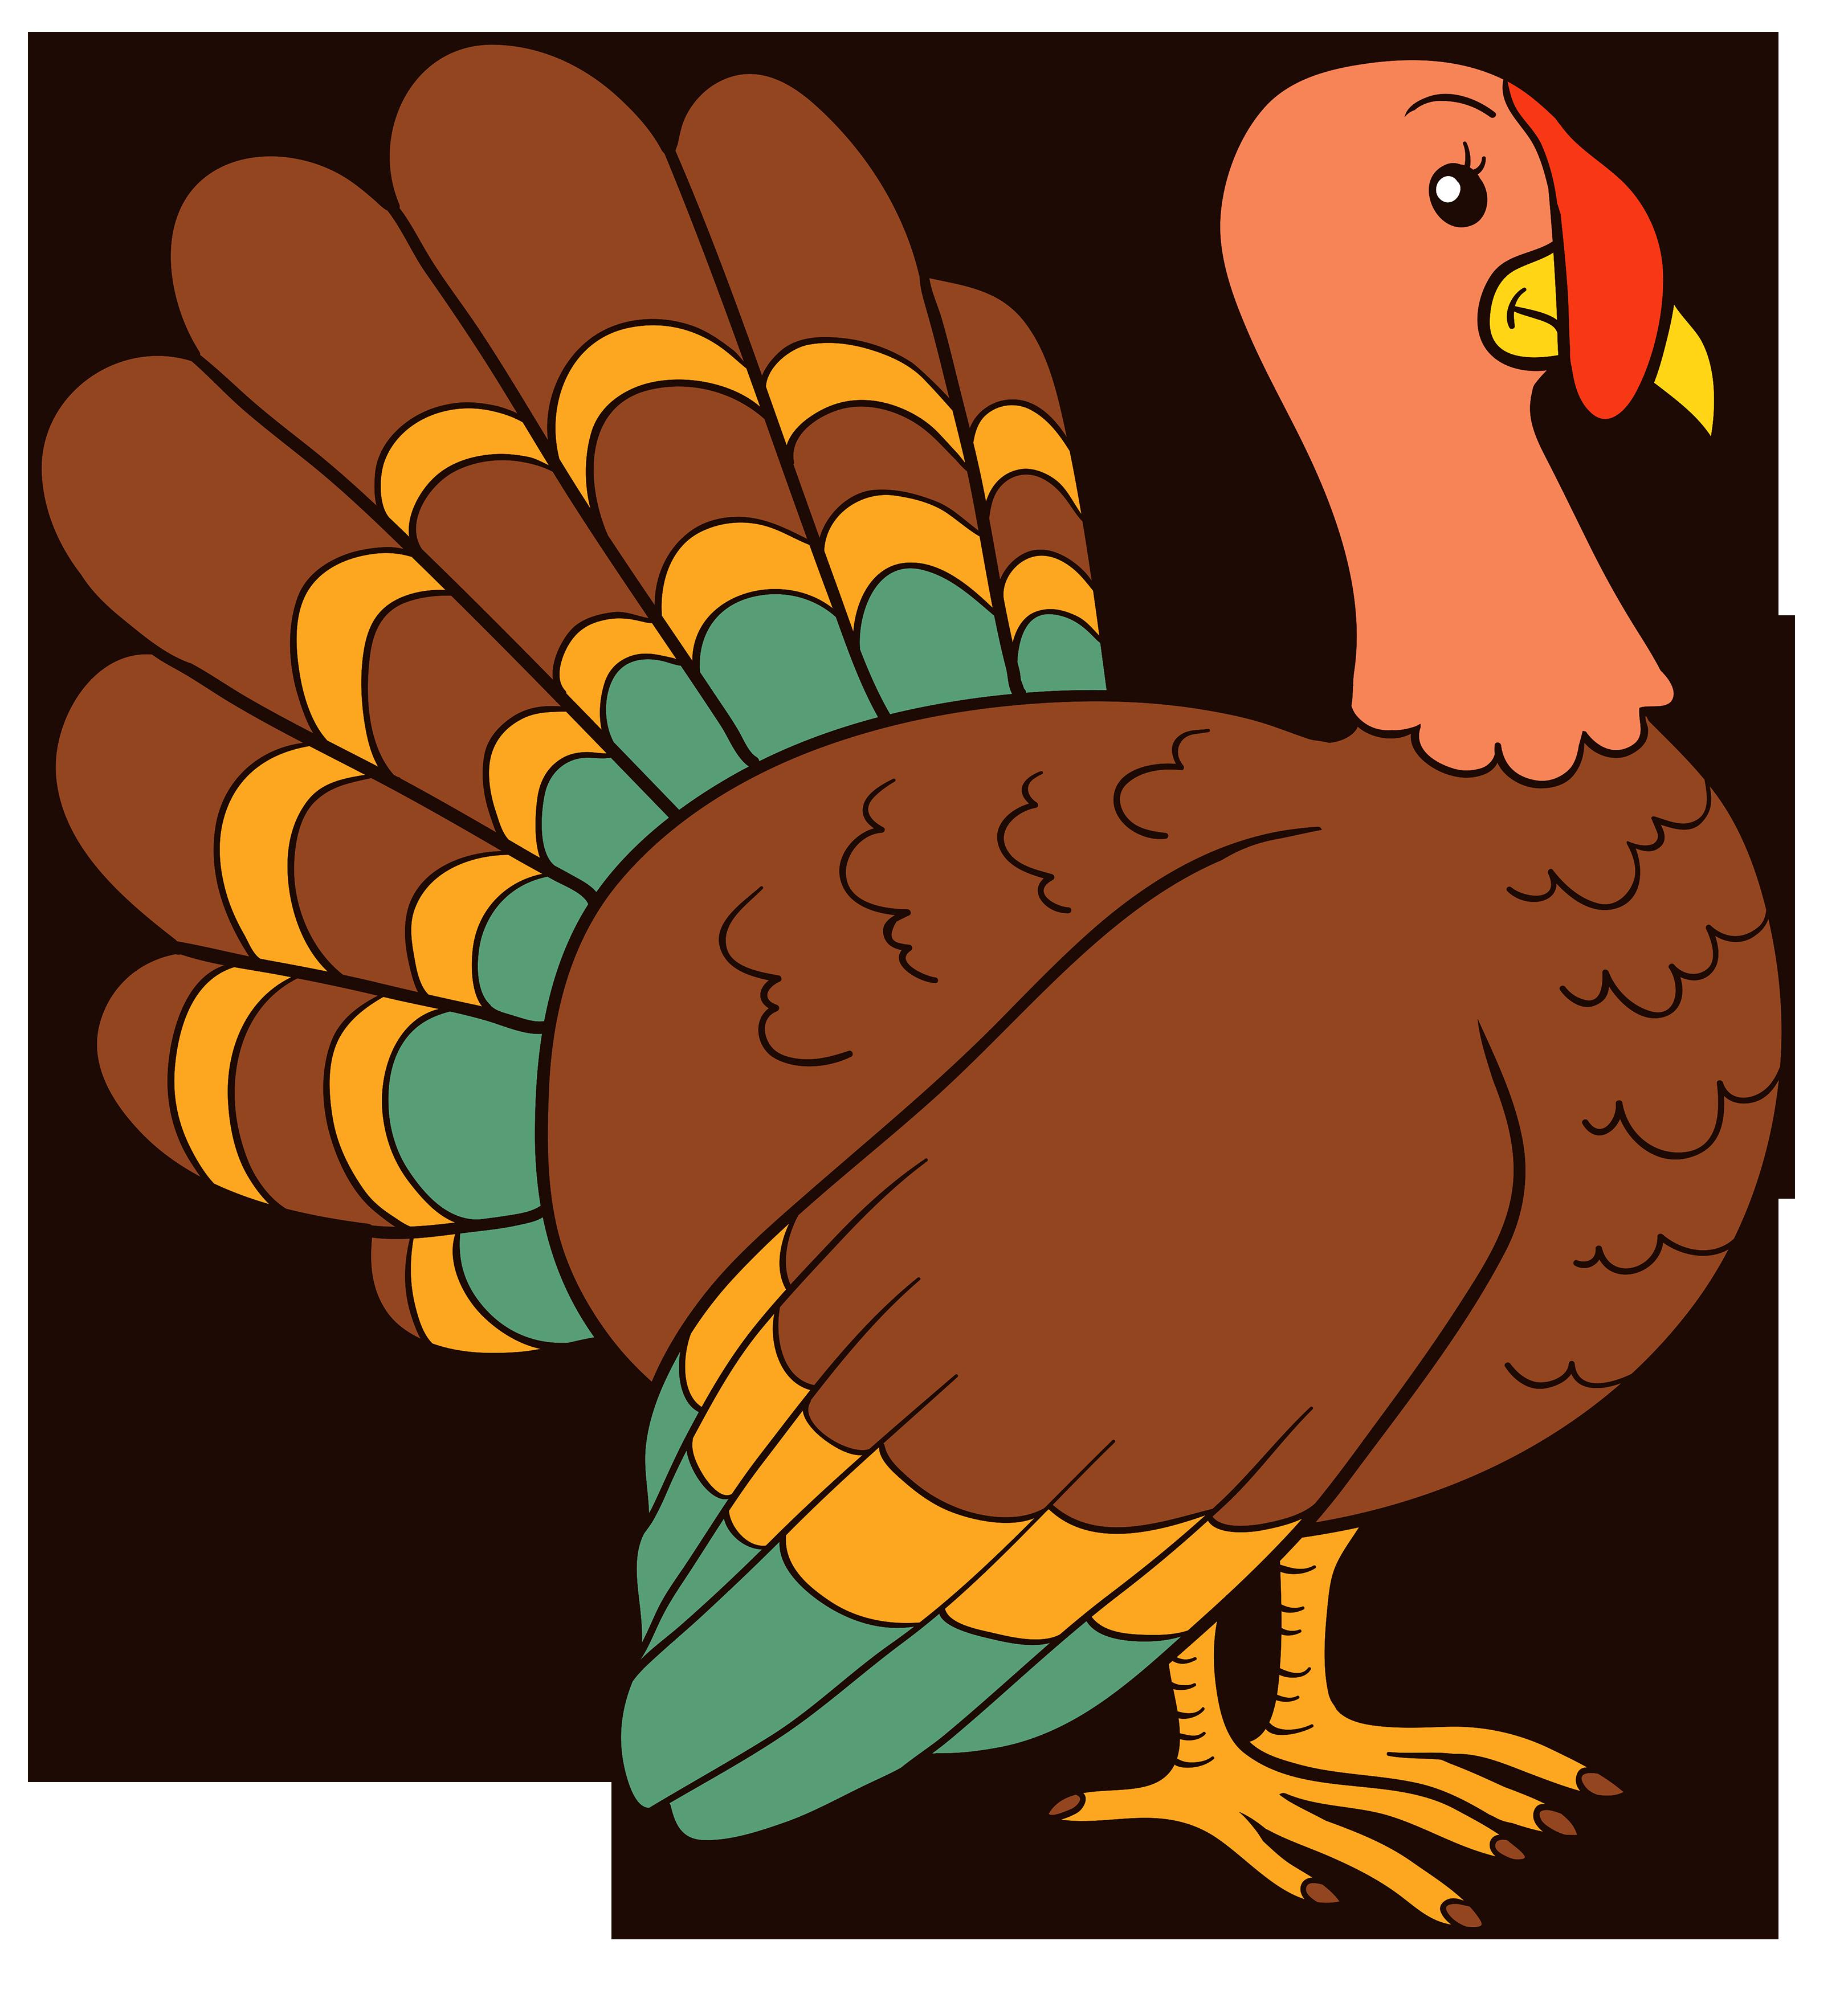 Turkeys clipart. Turkey png image best